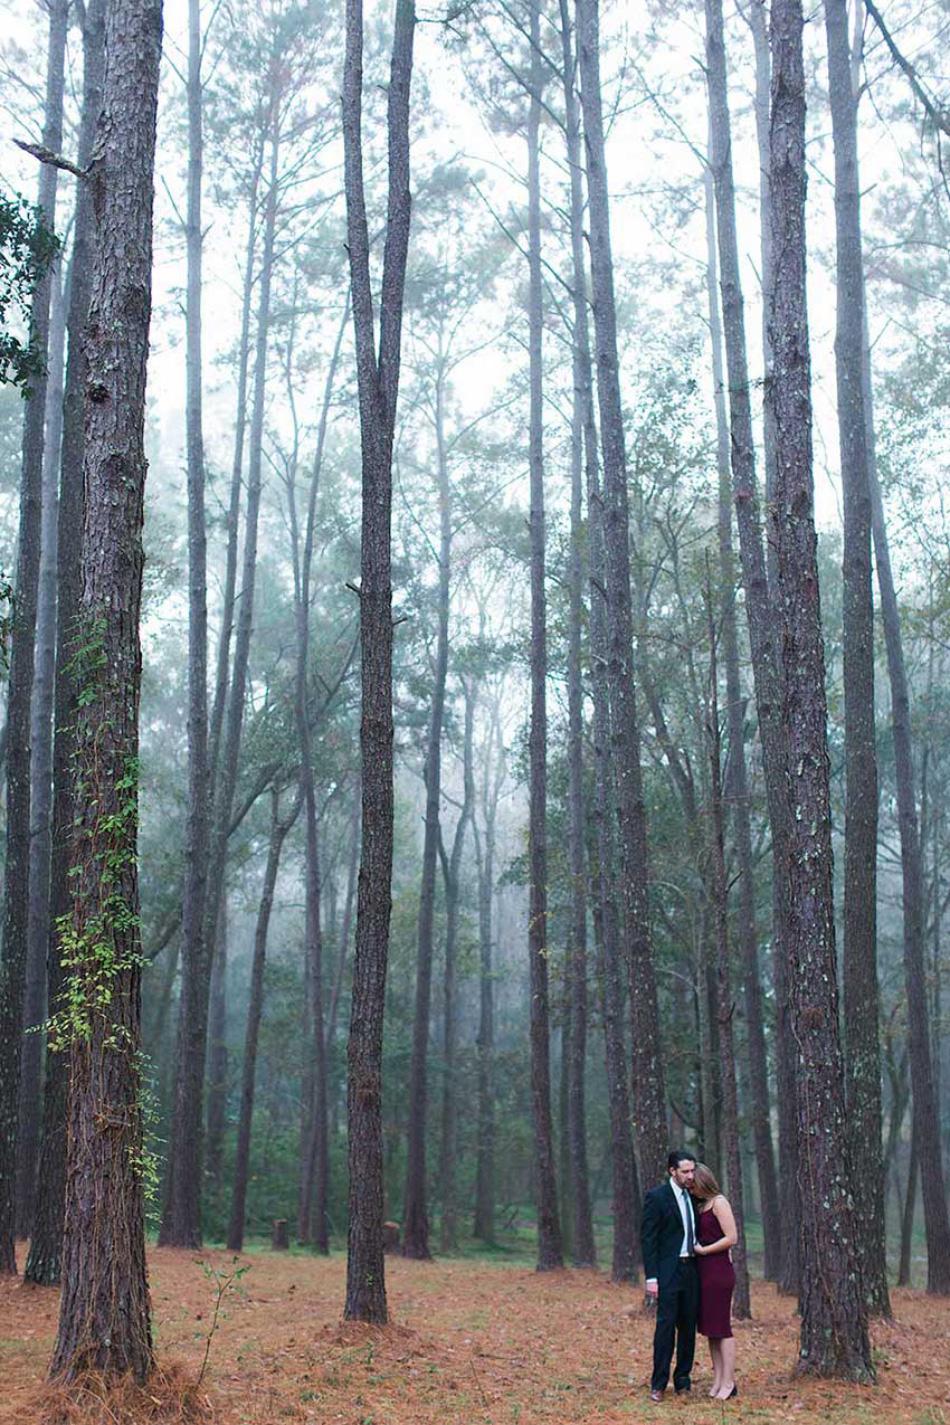 dude_nicole_woods2.jpg